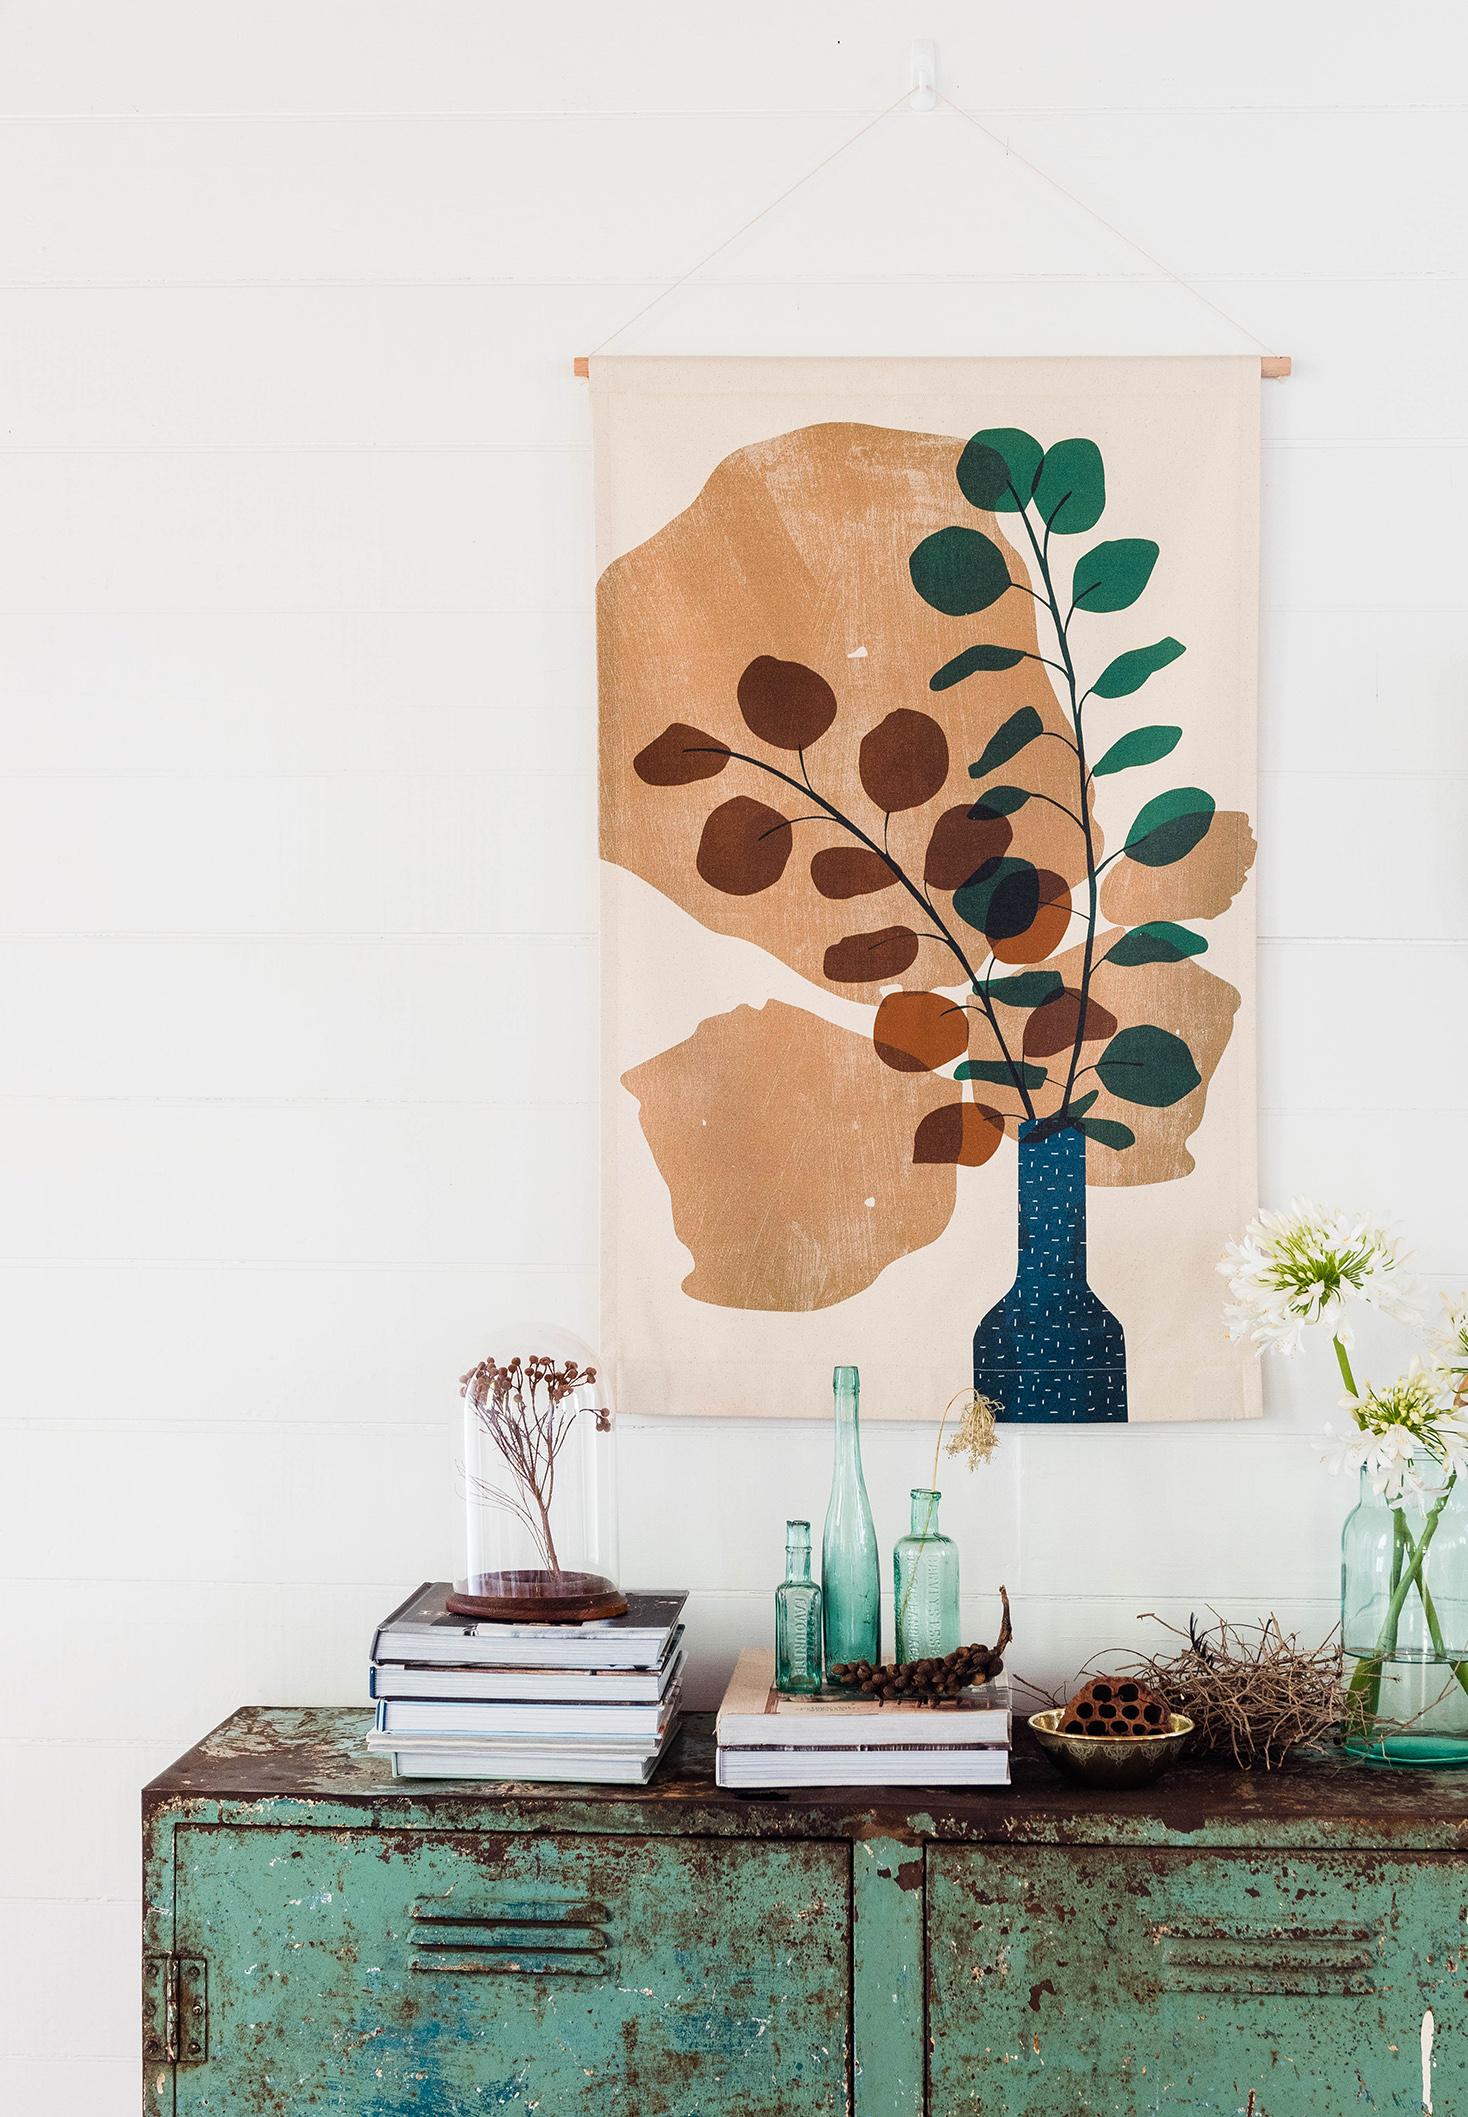 Sepia Silver Dollar midi wall hanging from Home Dweller  / Photography: Hannah Puechmarin / Styling: Cheryl Car, Albert & Grace